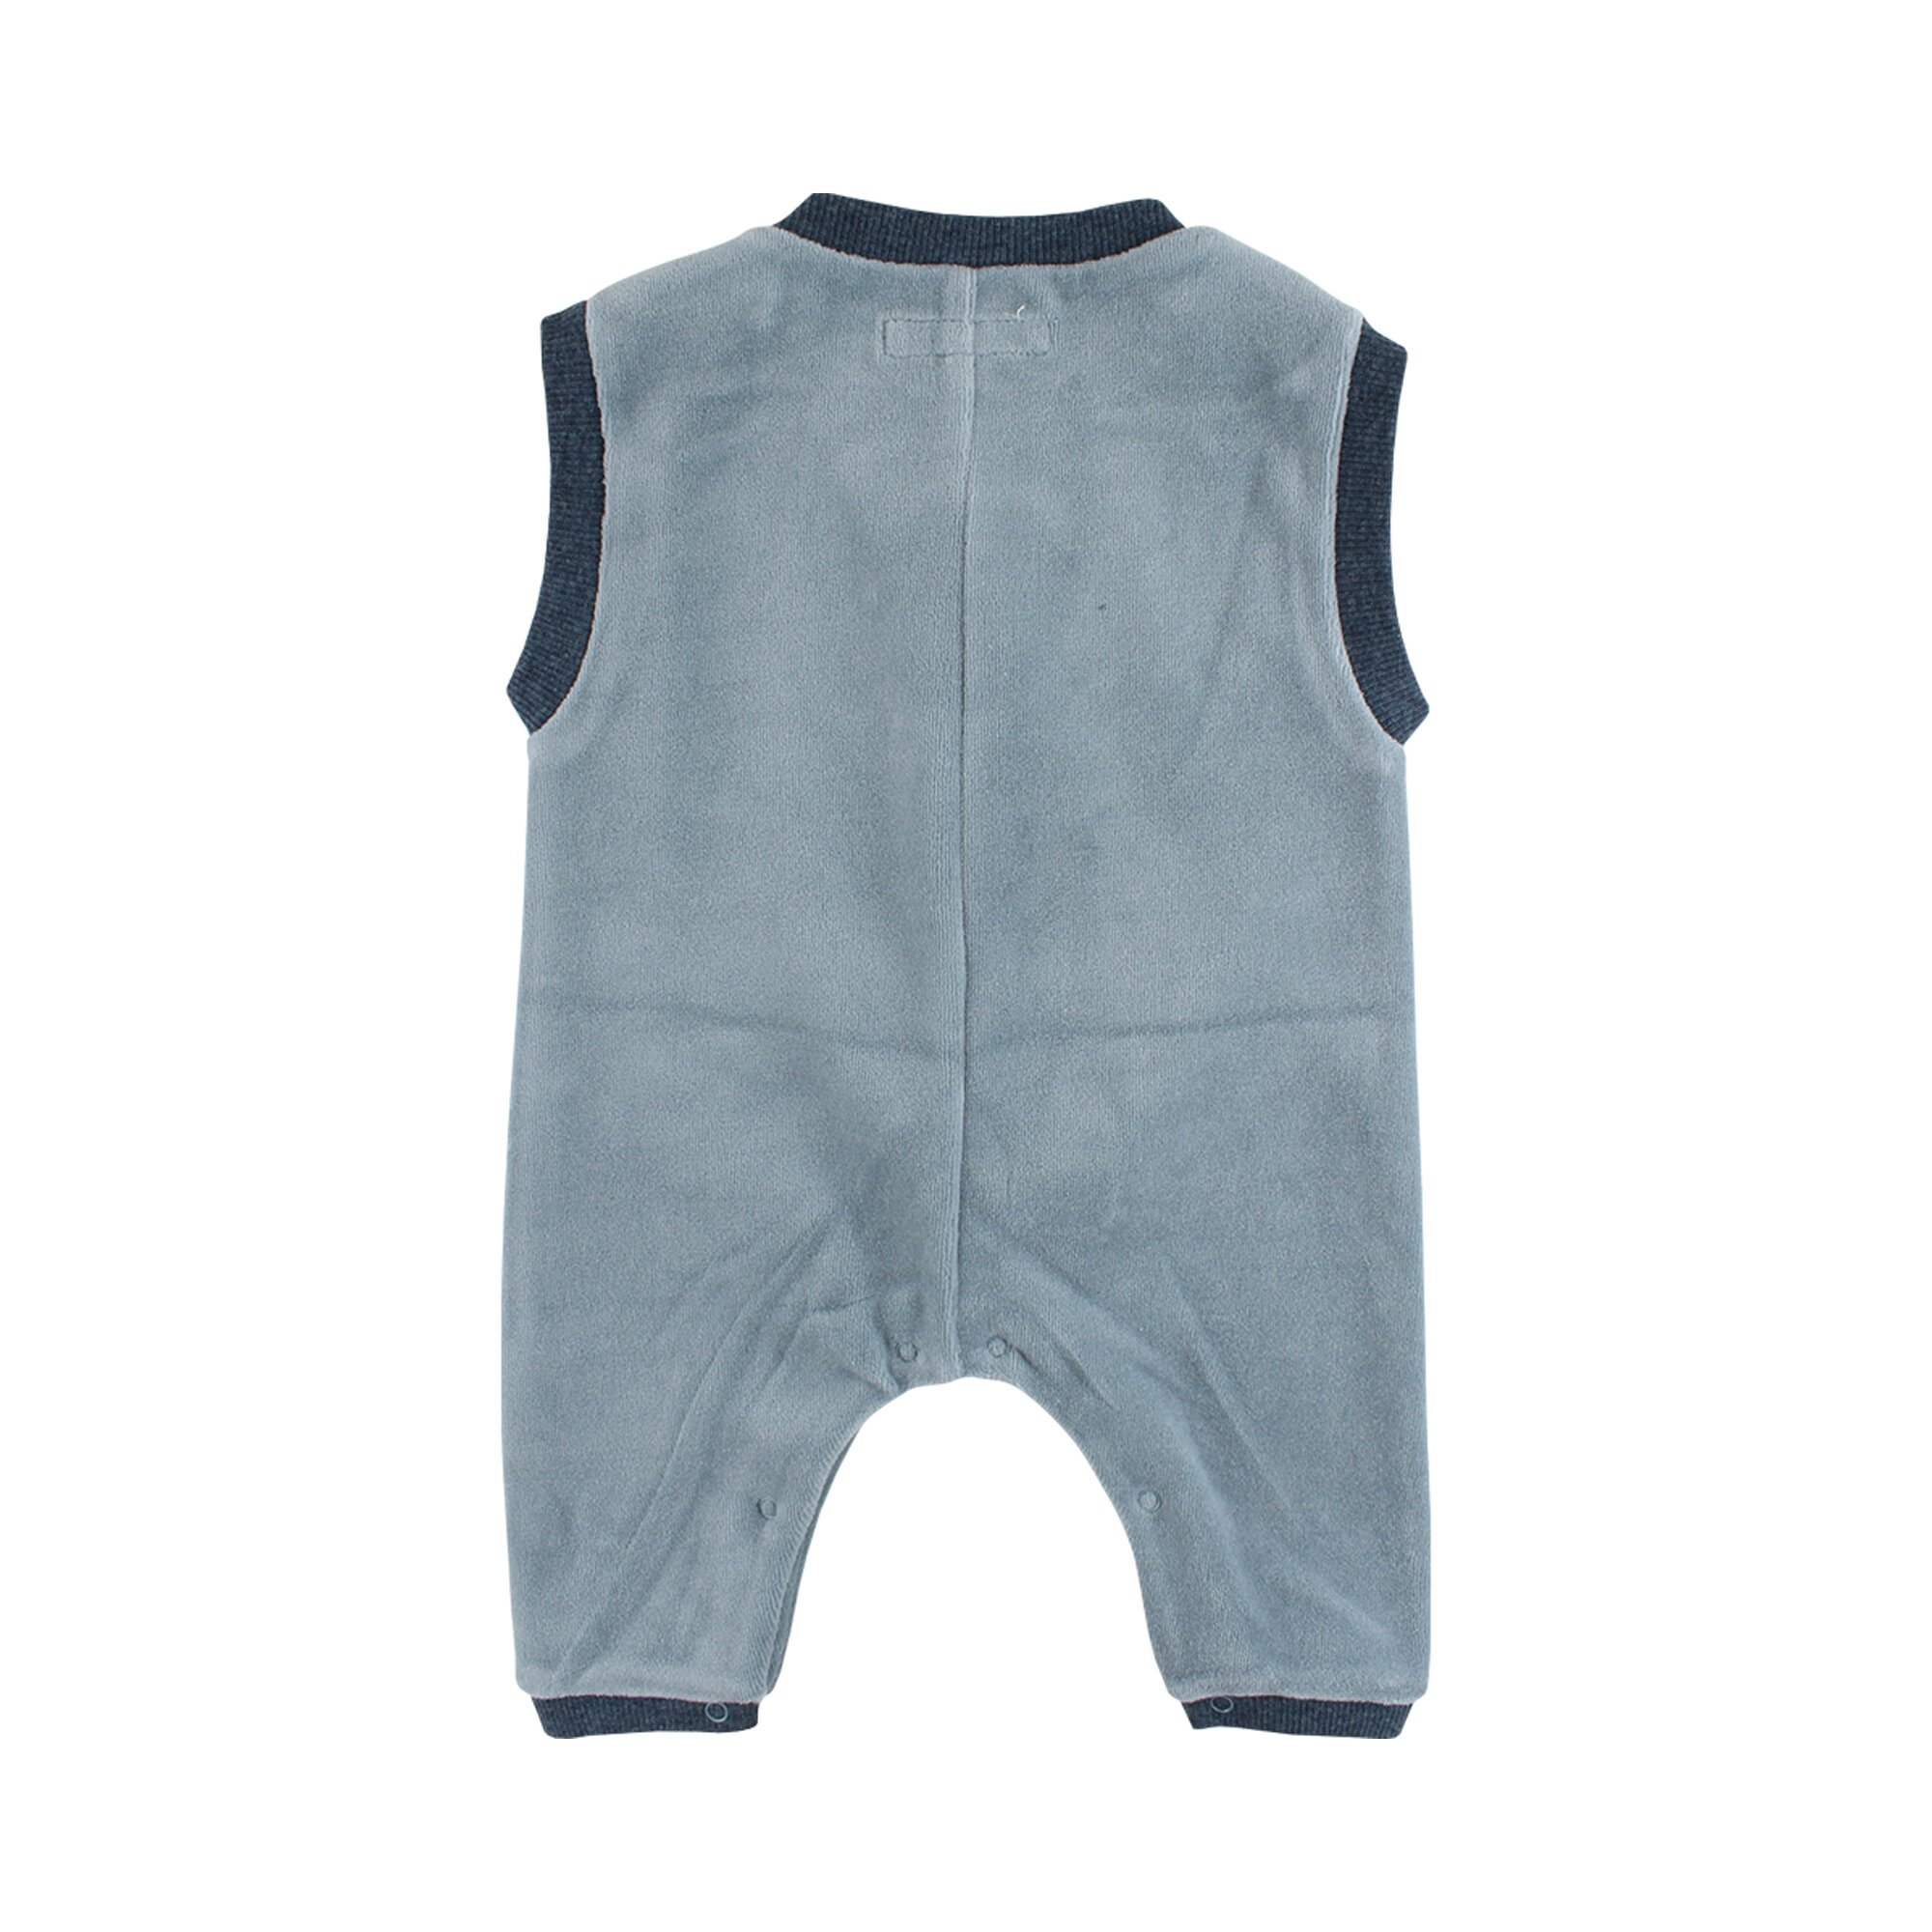 Small Rags Nicki-Overall Small Rags Preisvergleich